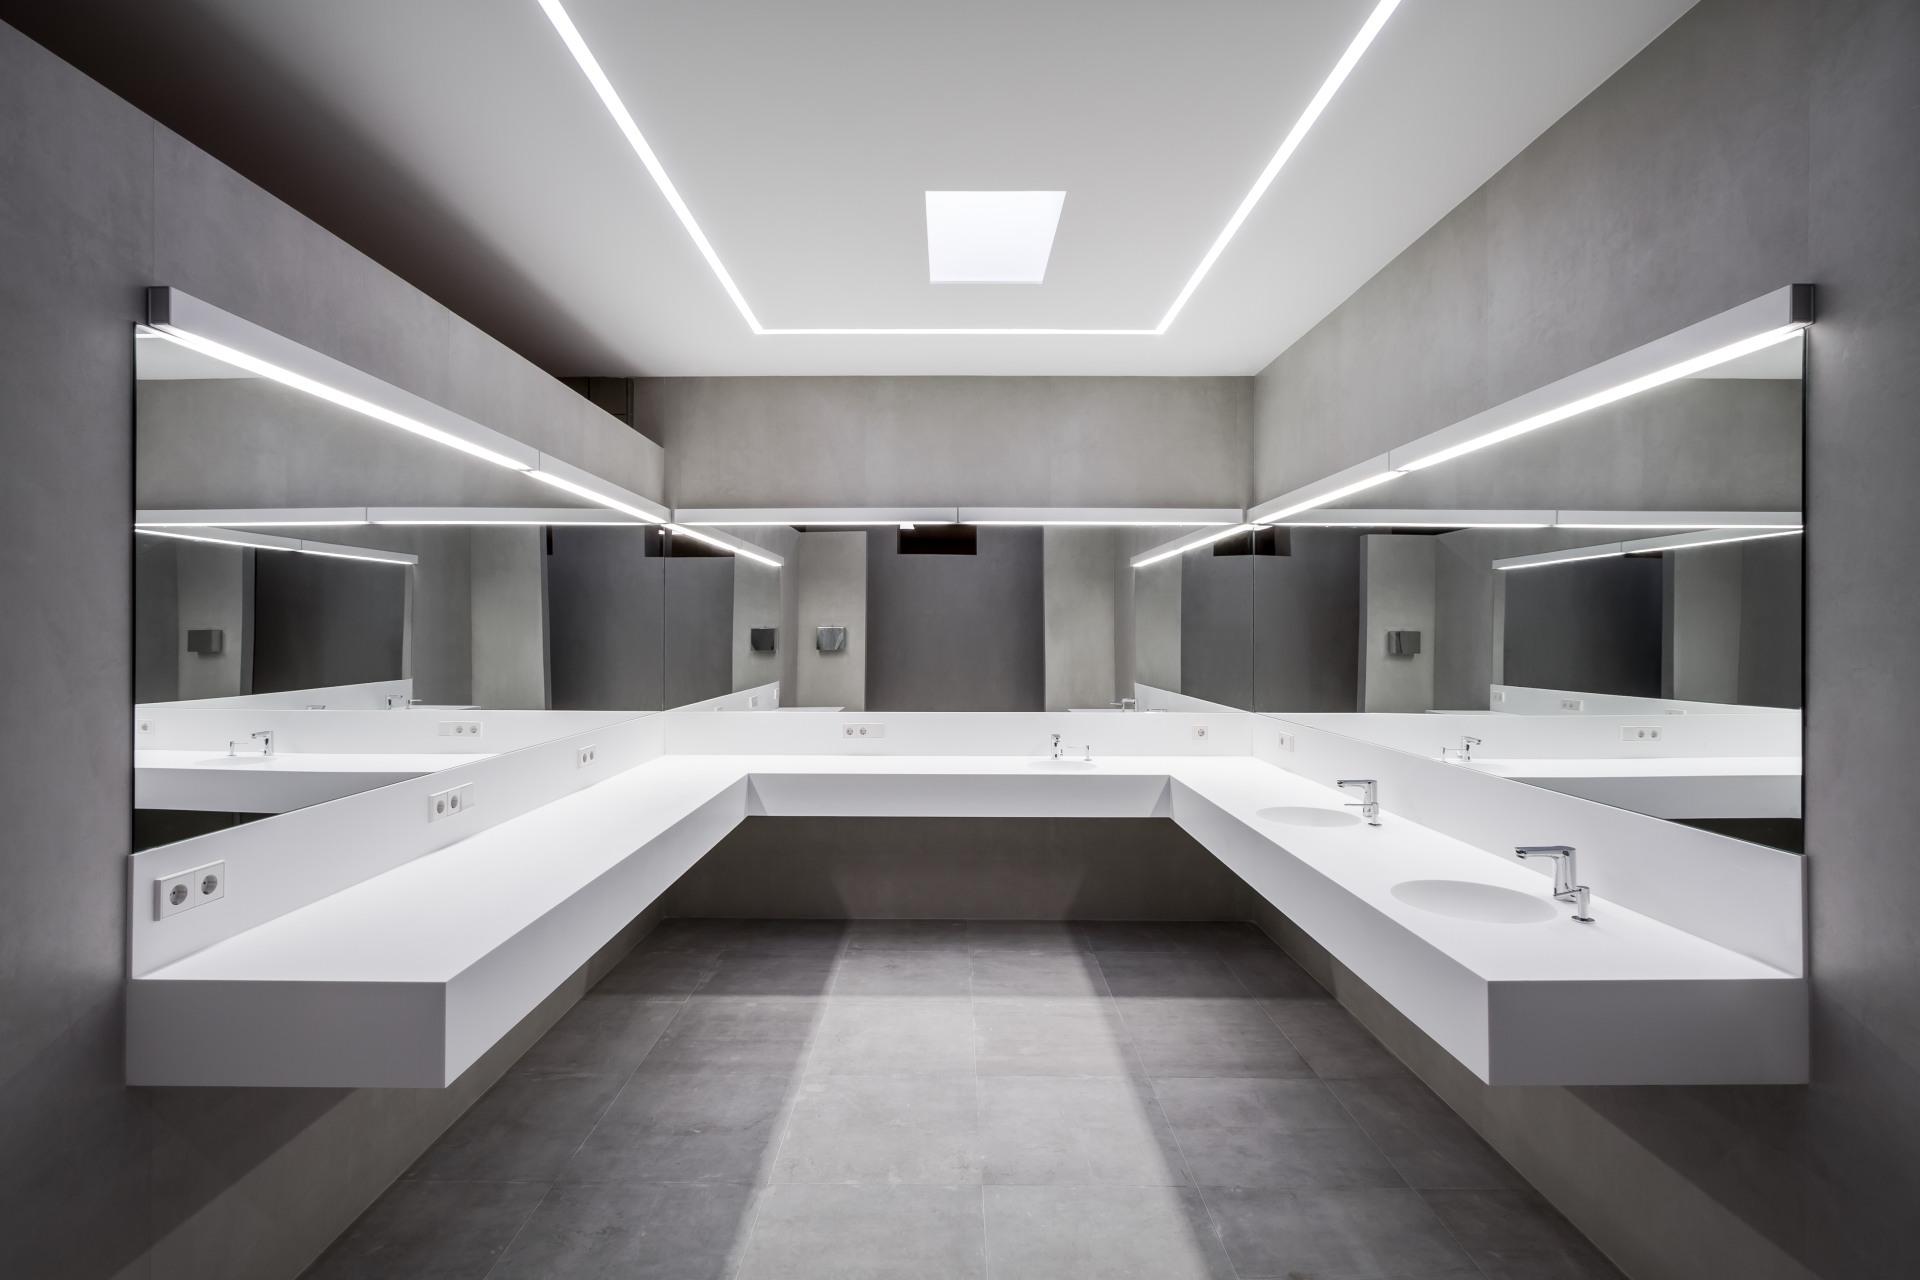 fotografia-arquitectura-valencia-german-cabo-bfm-edificatoria-club-tenis (1)